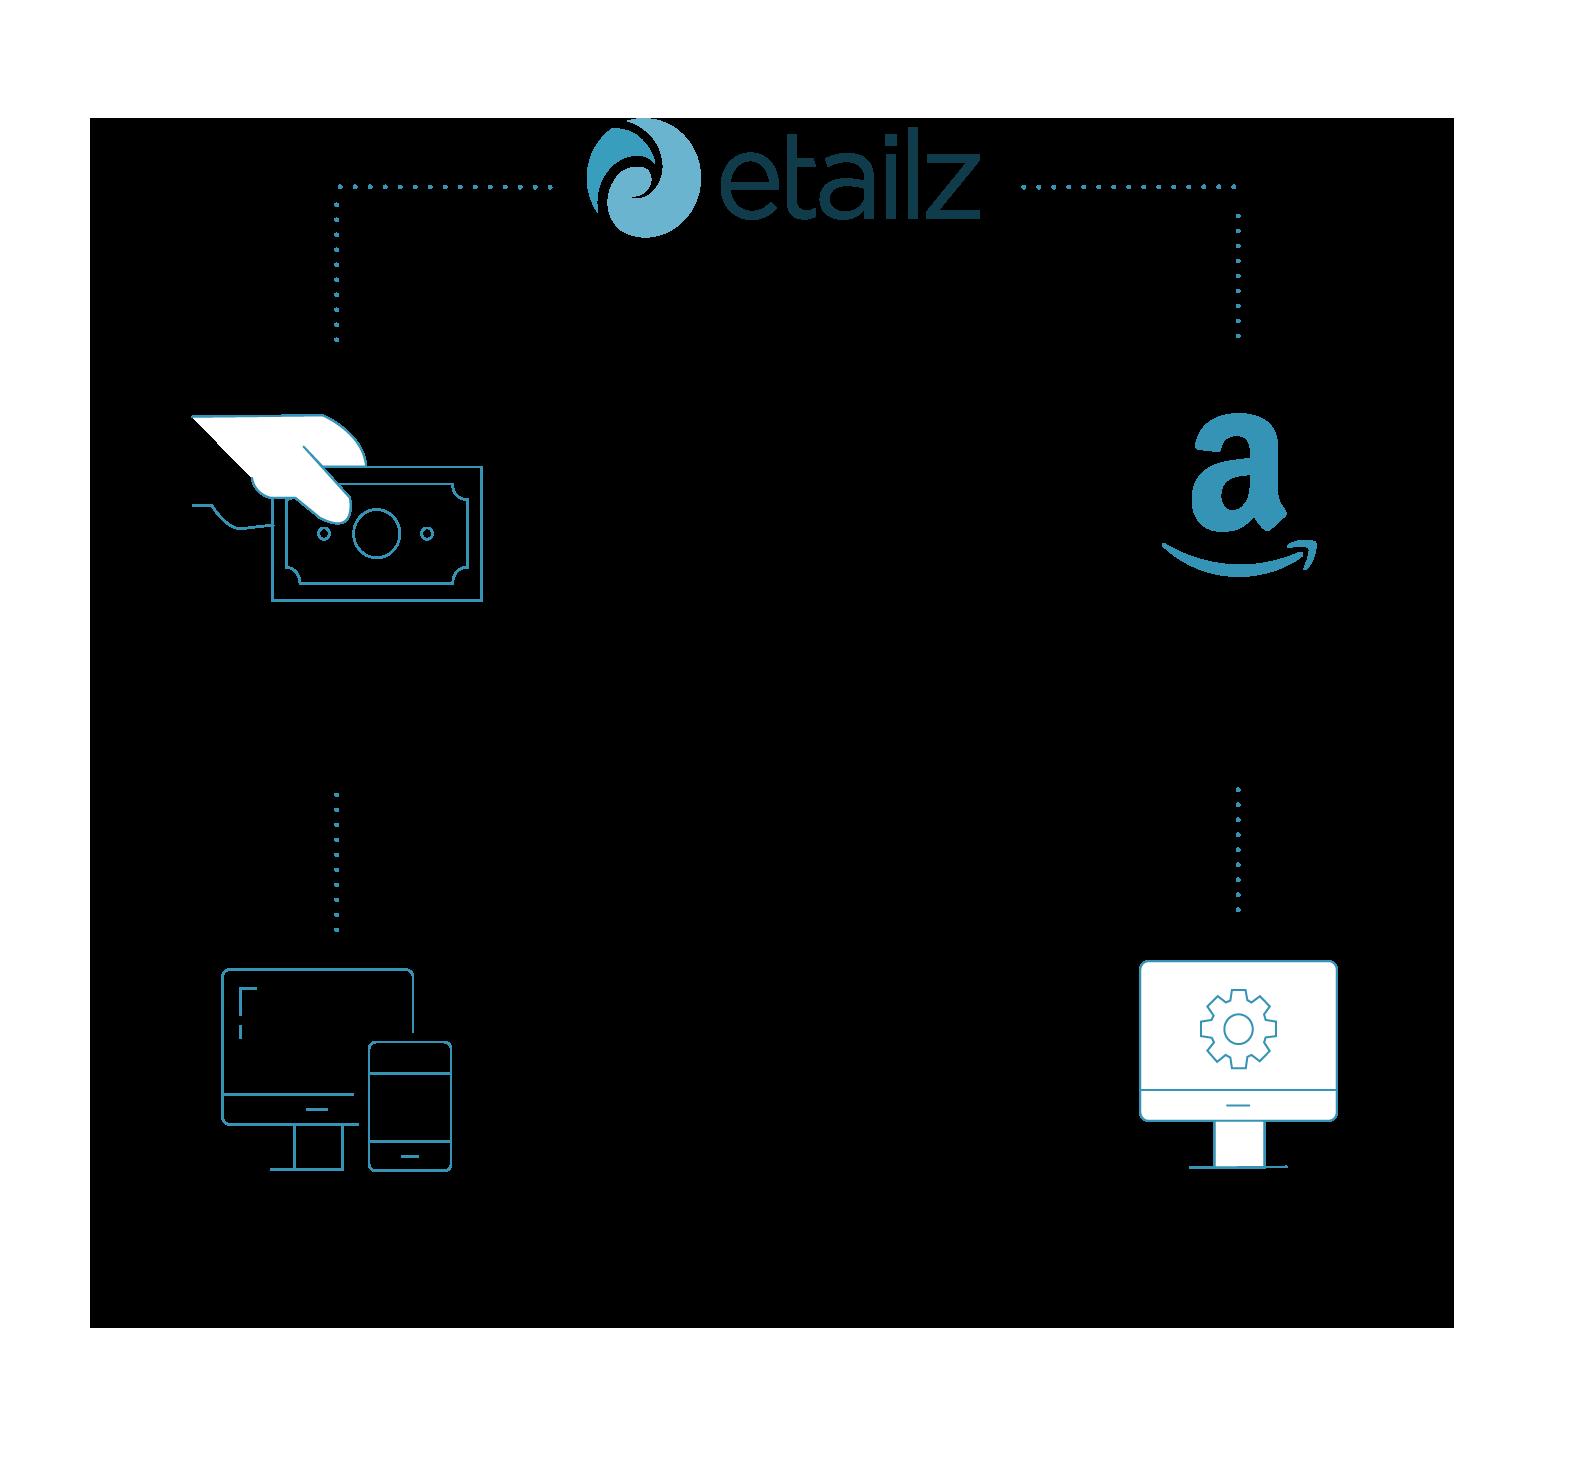 graph showing two paths to etailz partnership